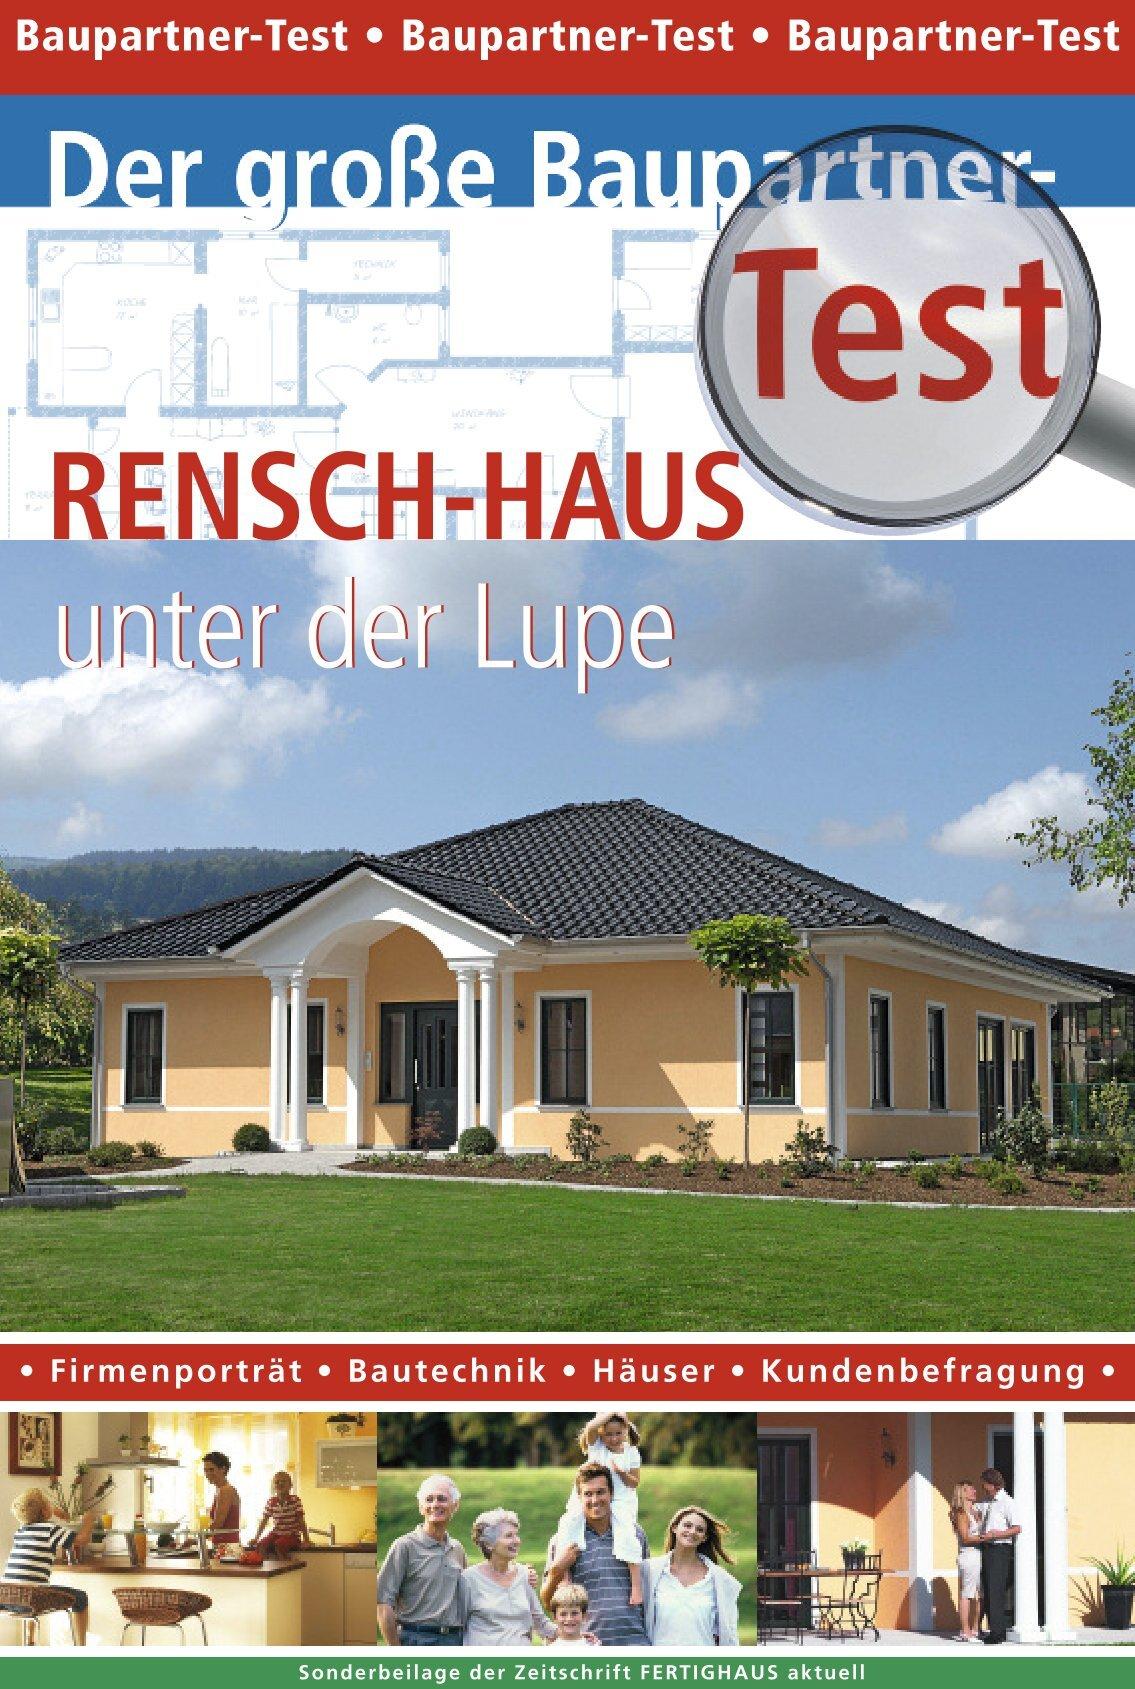 Rensch Haus